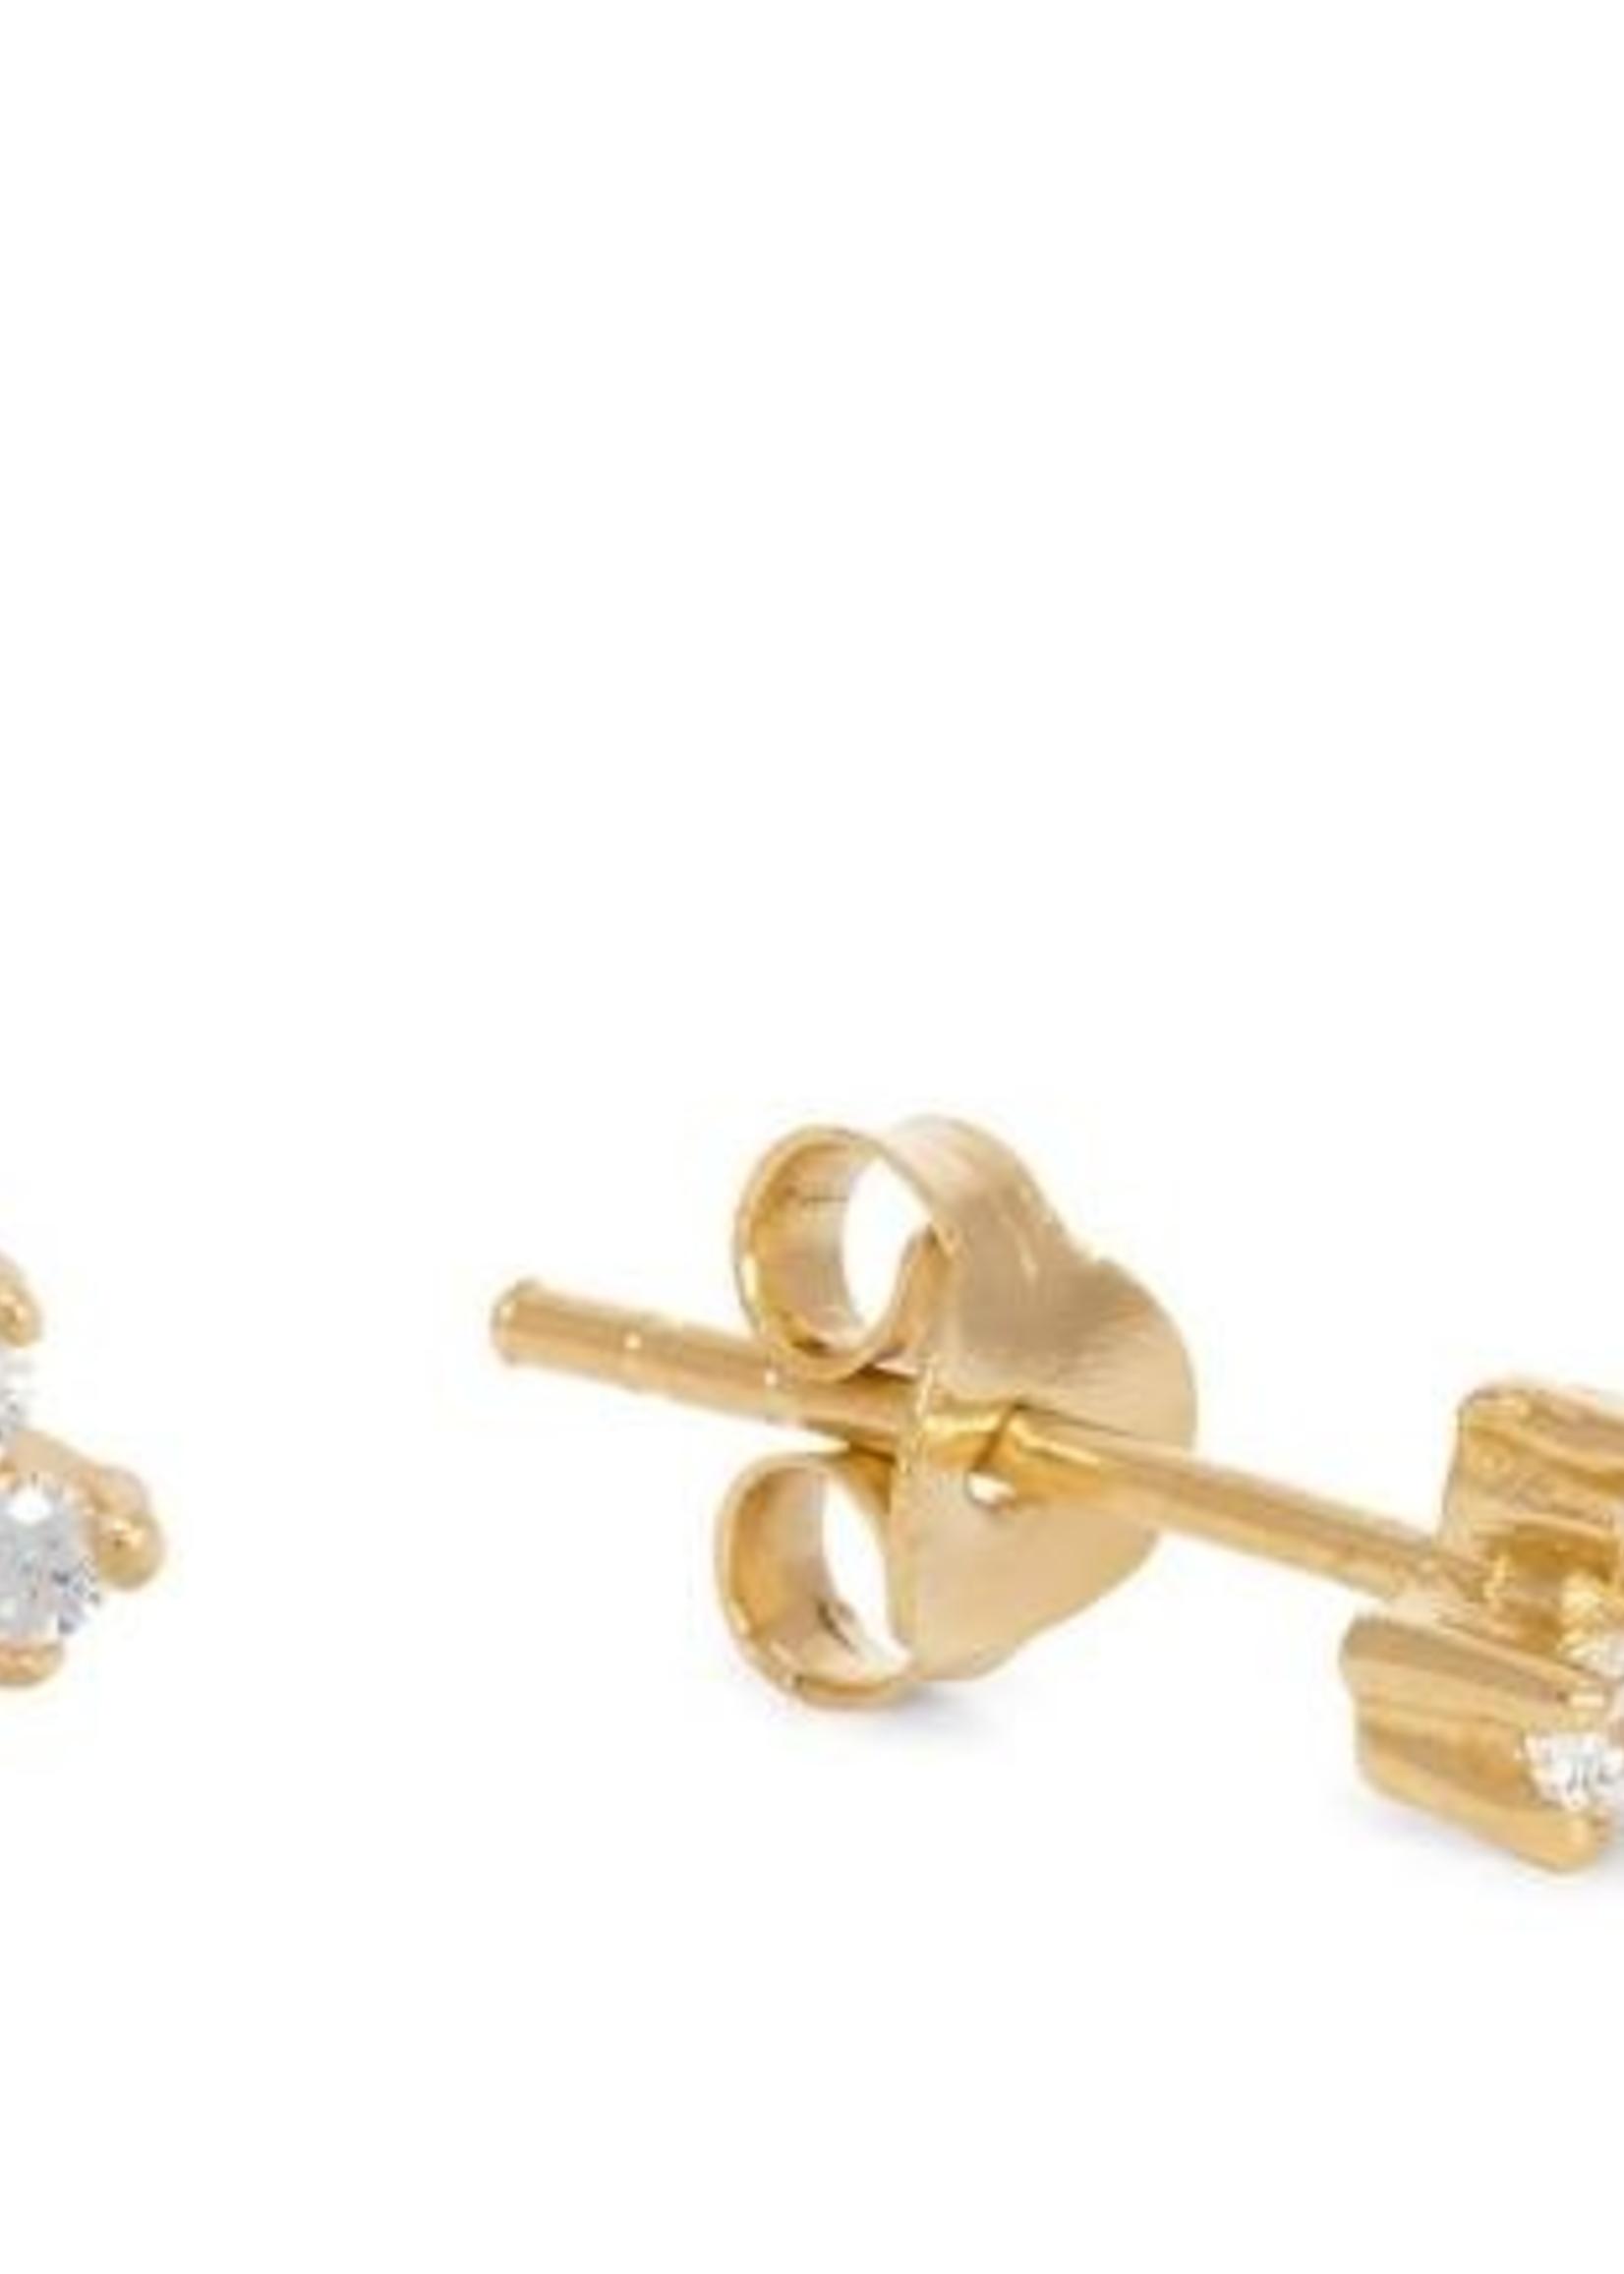 Fashionology Fashionology Clear quartz triple dot earpins gold plated